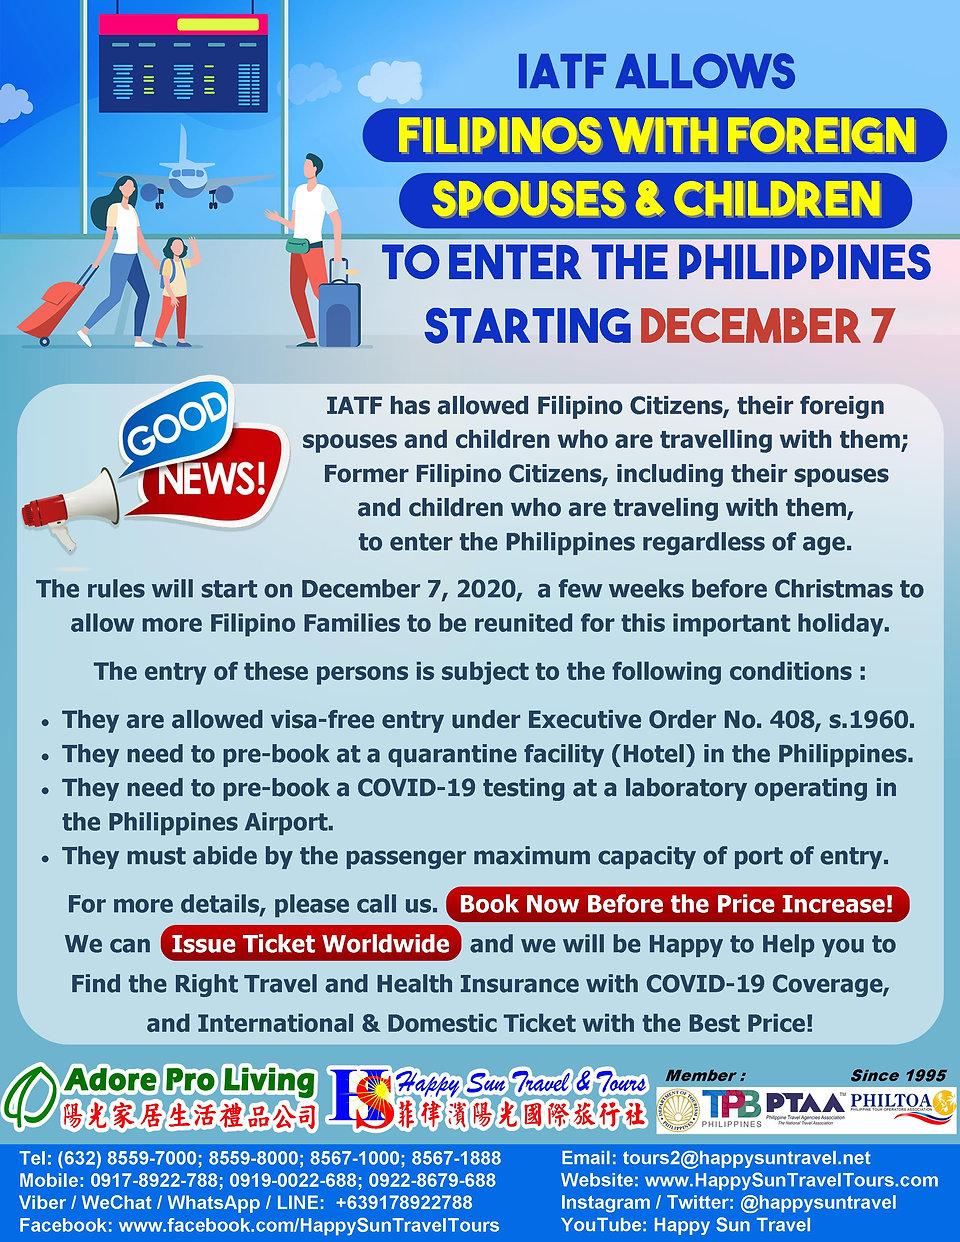 01.FilipinosWithSpouse&KidsAllowedEnterP